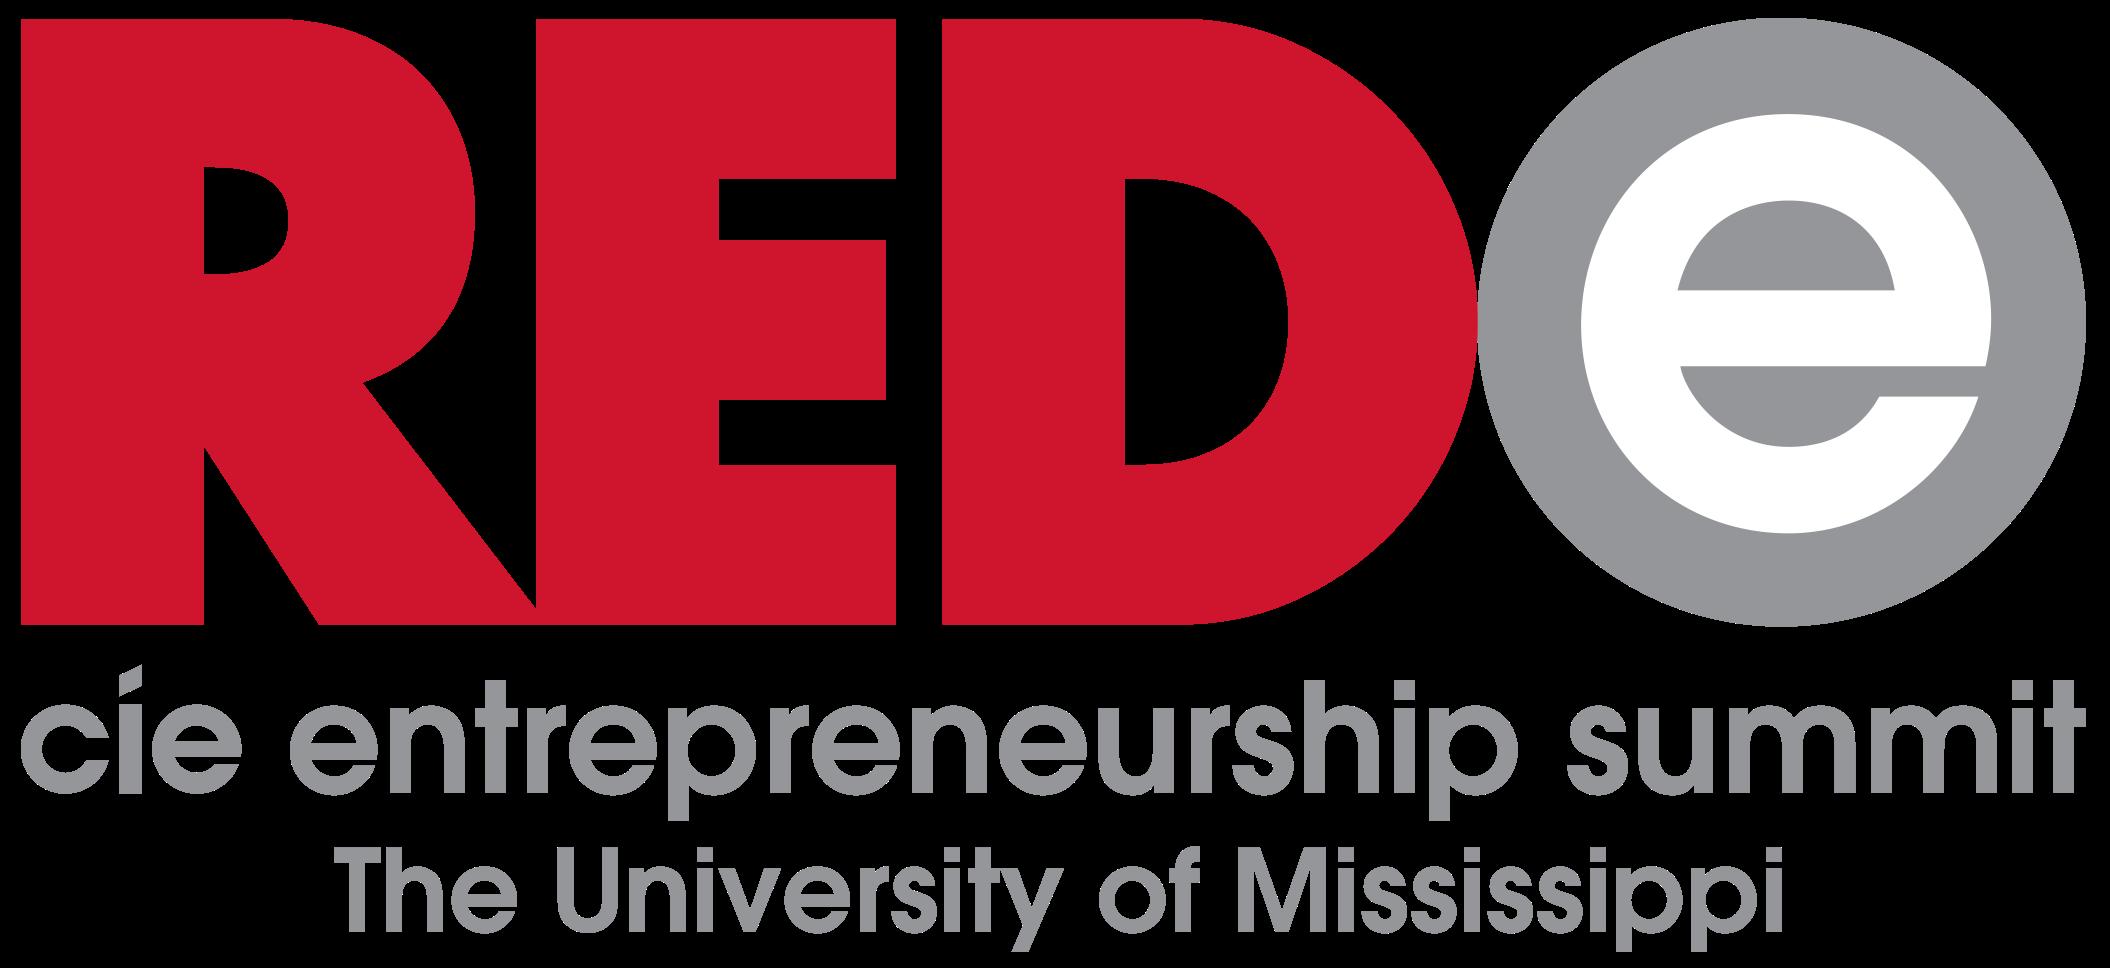 REDe Entrepreneurship Summit – CIE | Ole Miss